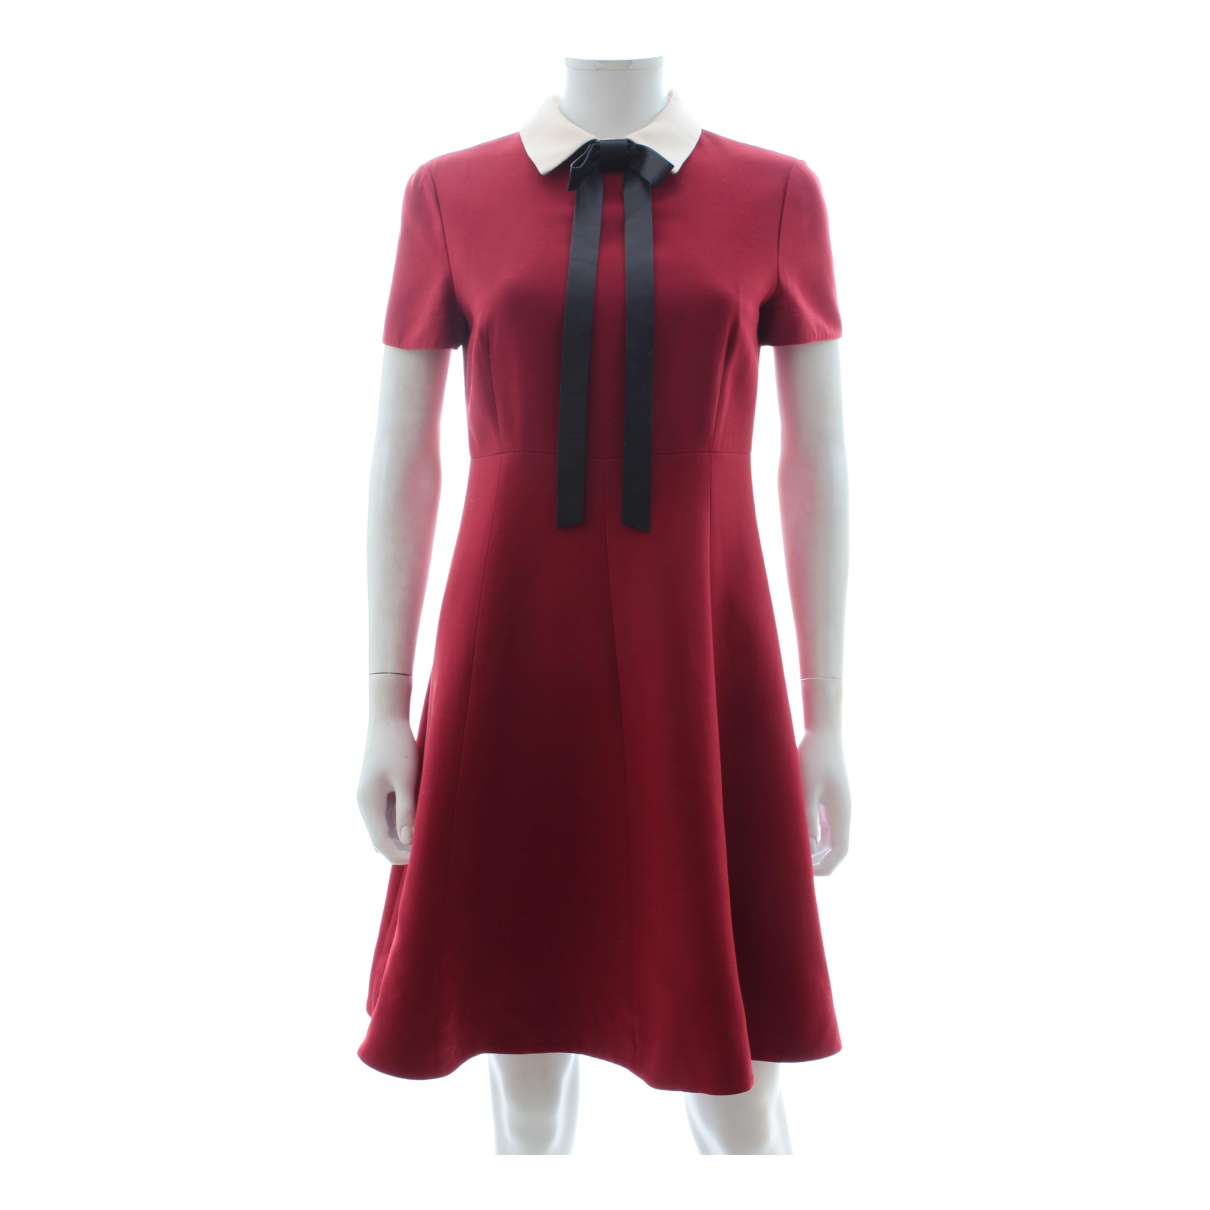 Valentino Garavani \N Red Wool dress for Women 42 IT